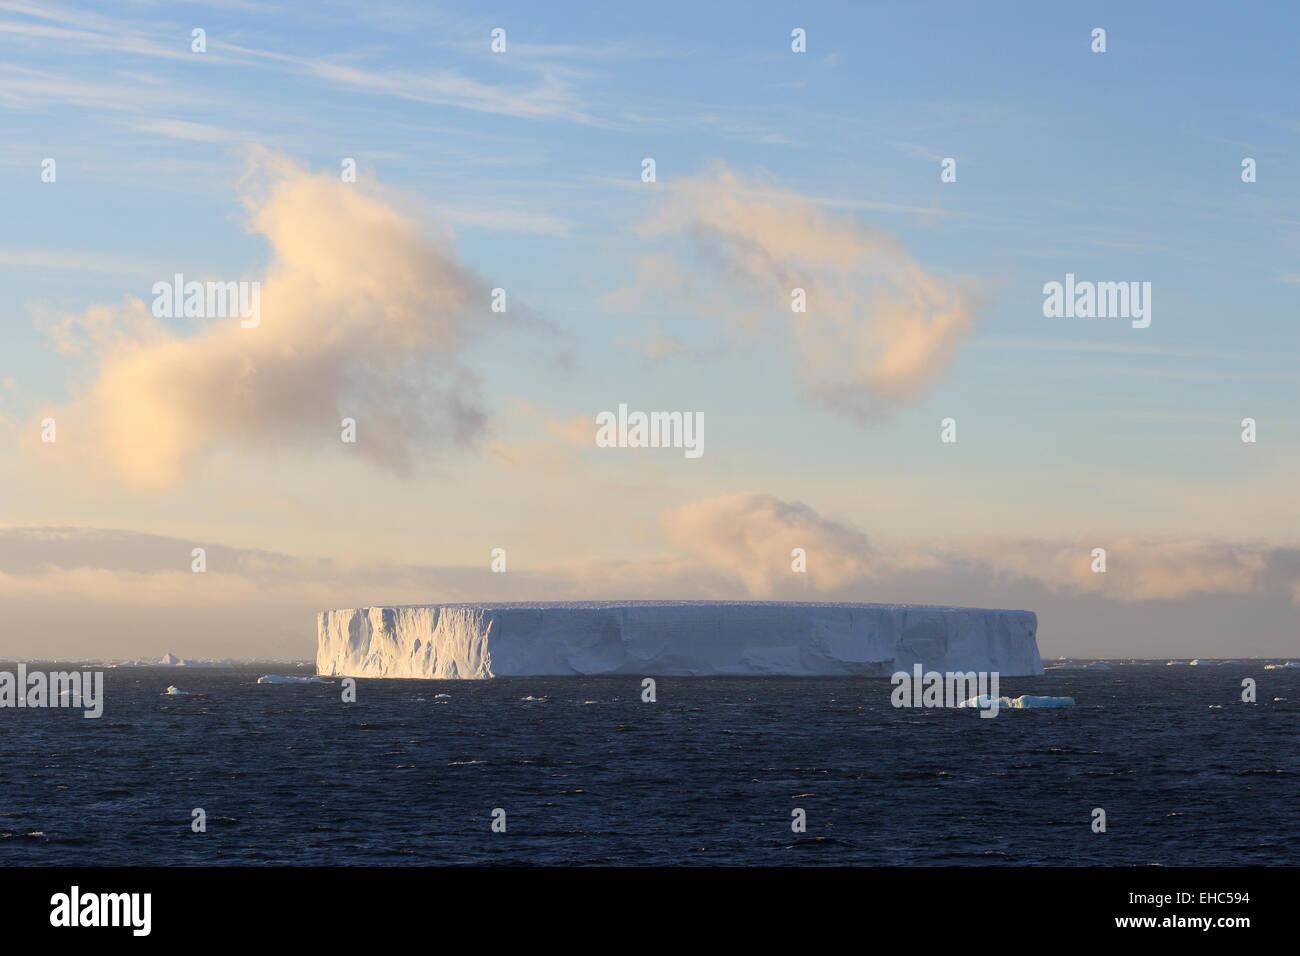 Iceberg, ice berg, Antarctica tabular landscape during sunset. - Stock Image